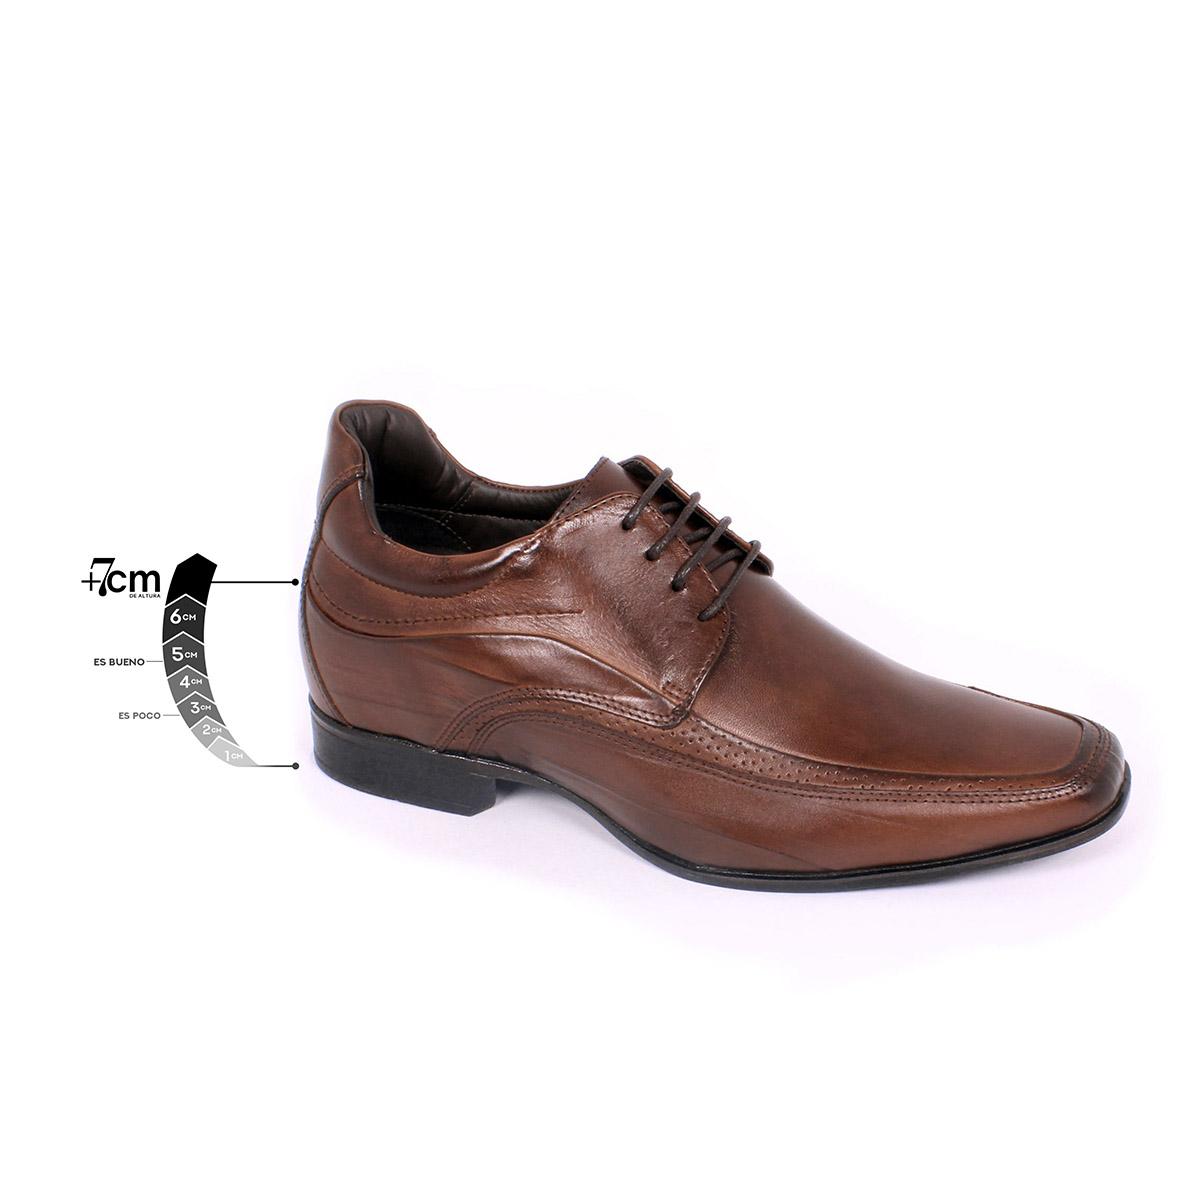 Zapato Formal Manager Café Max Denegri +7cms de Altura_75318